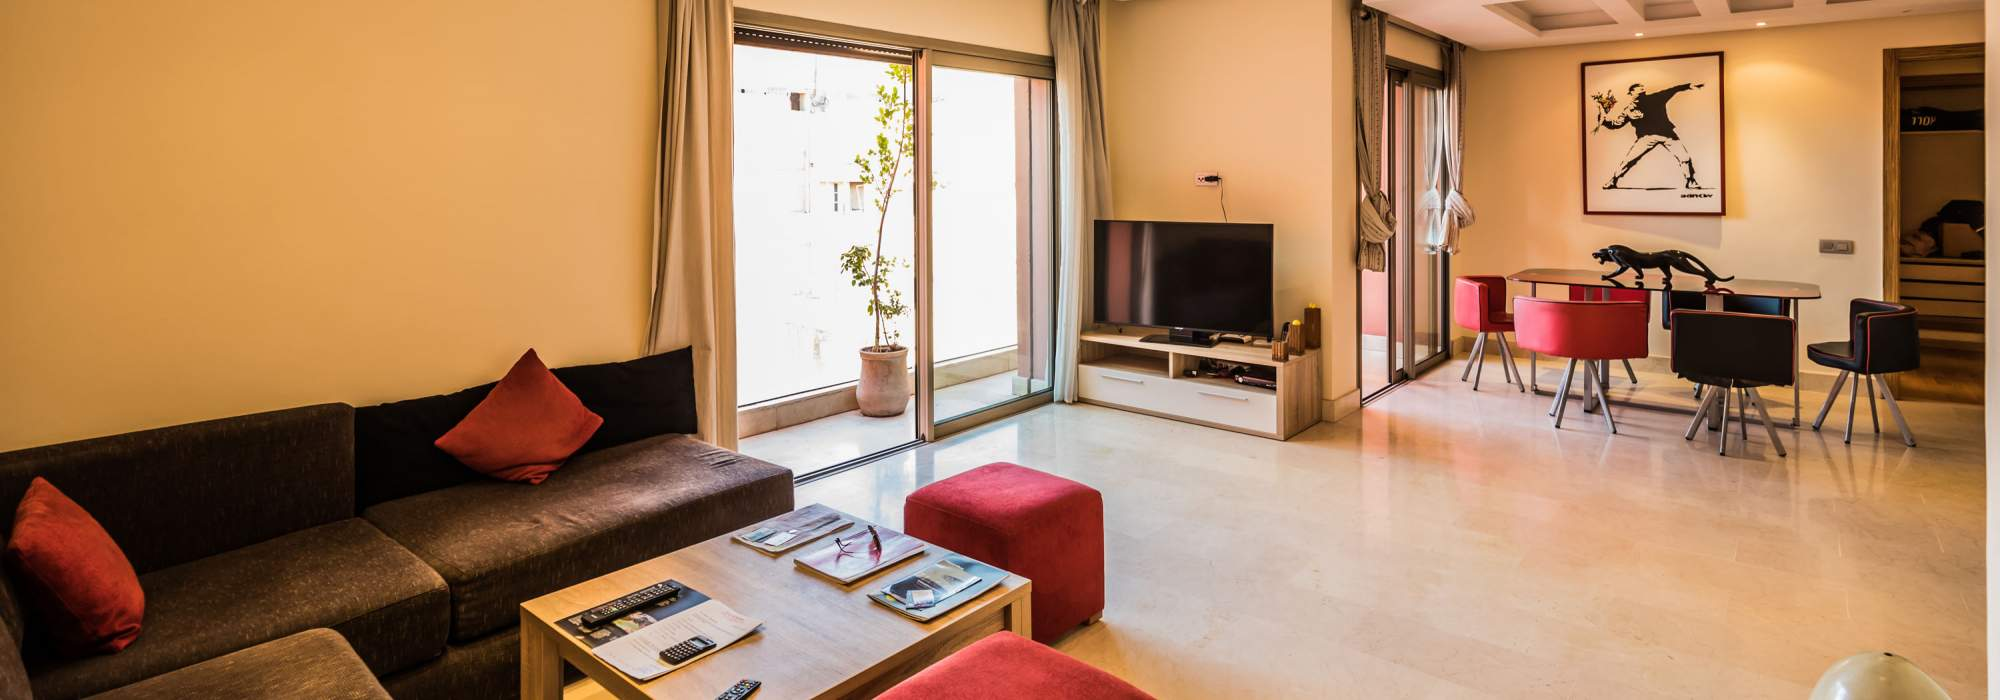 appartement de prestige a vendre marrakech